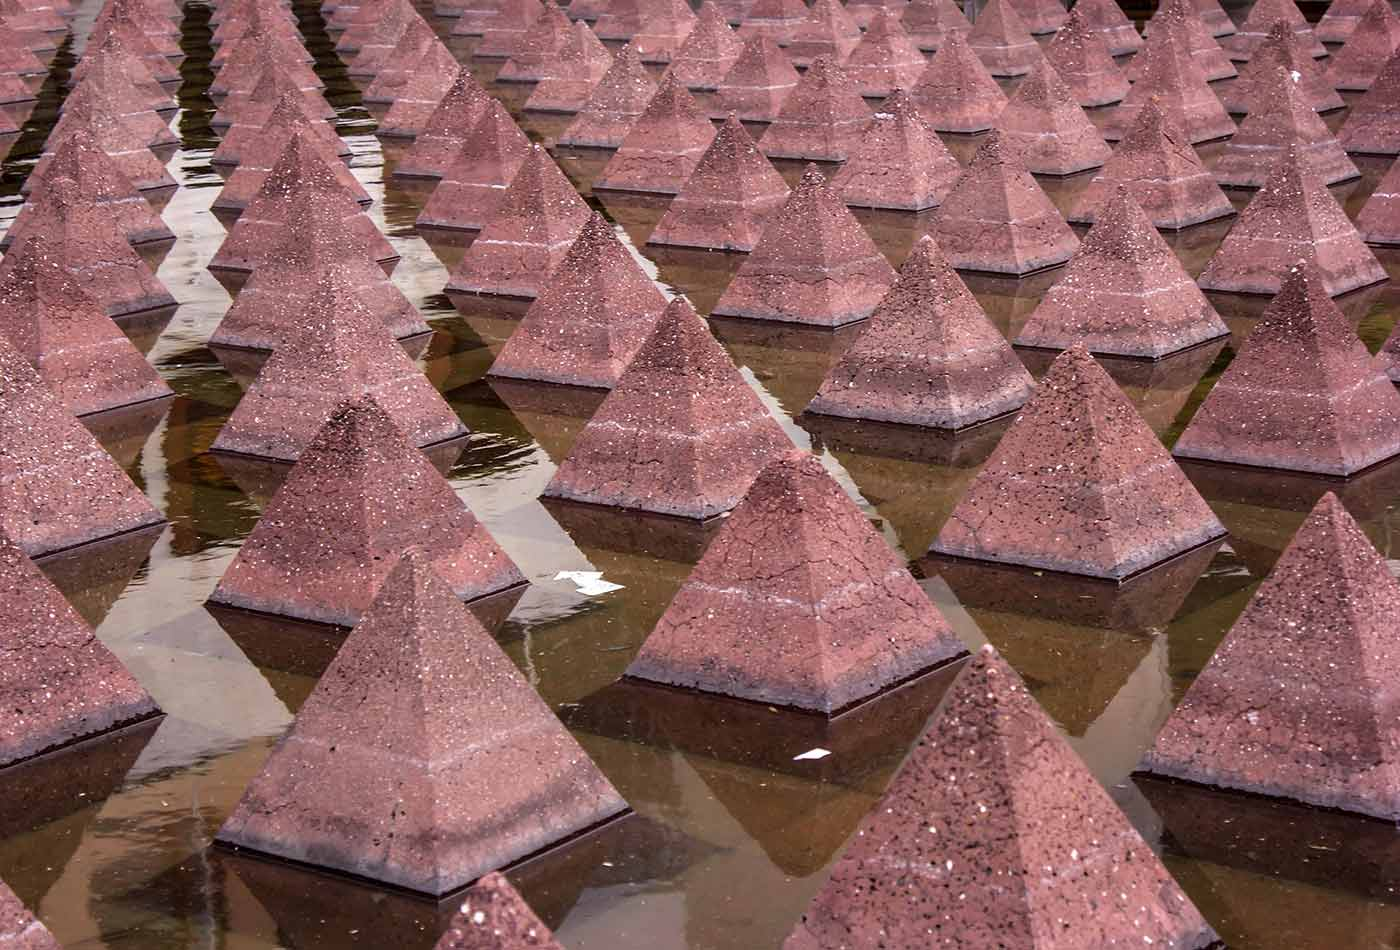 Pyramid pattern.